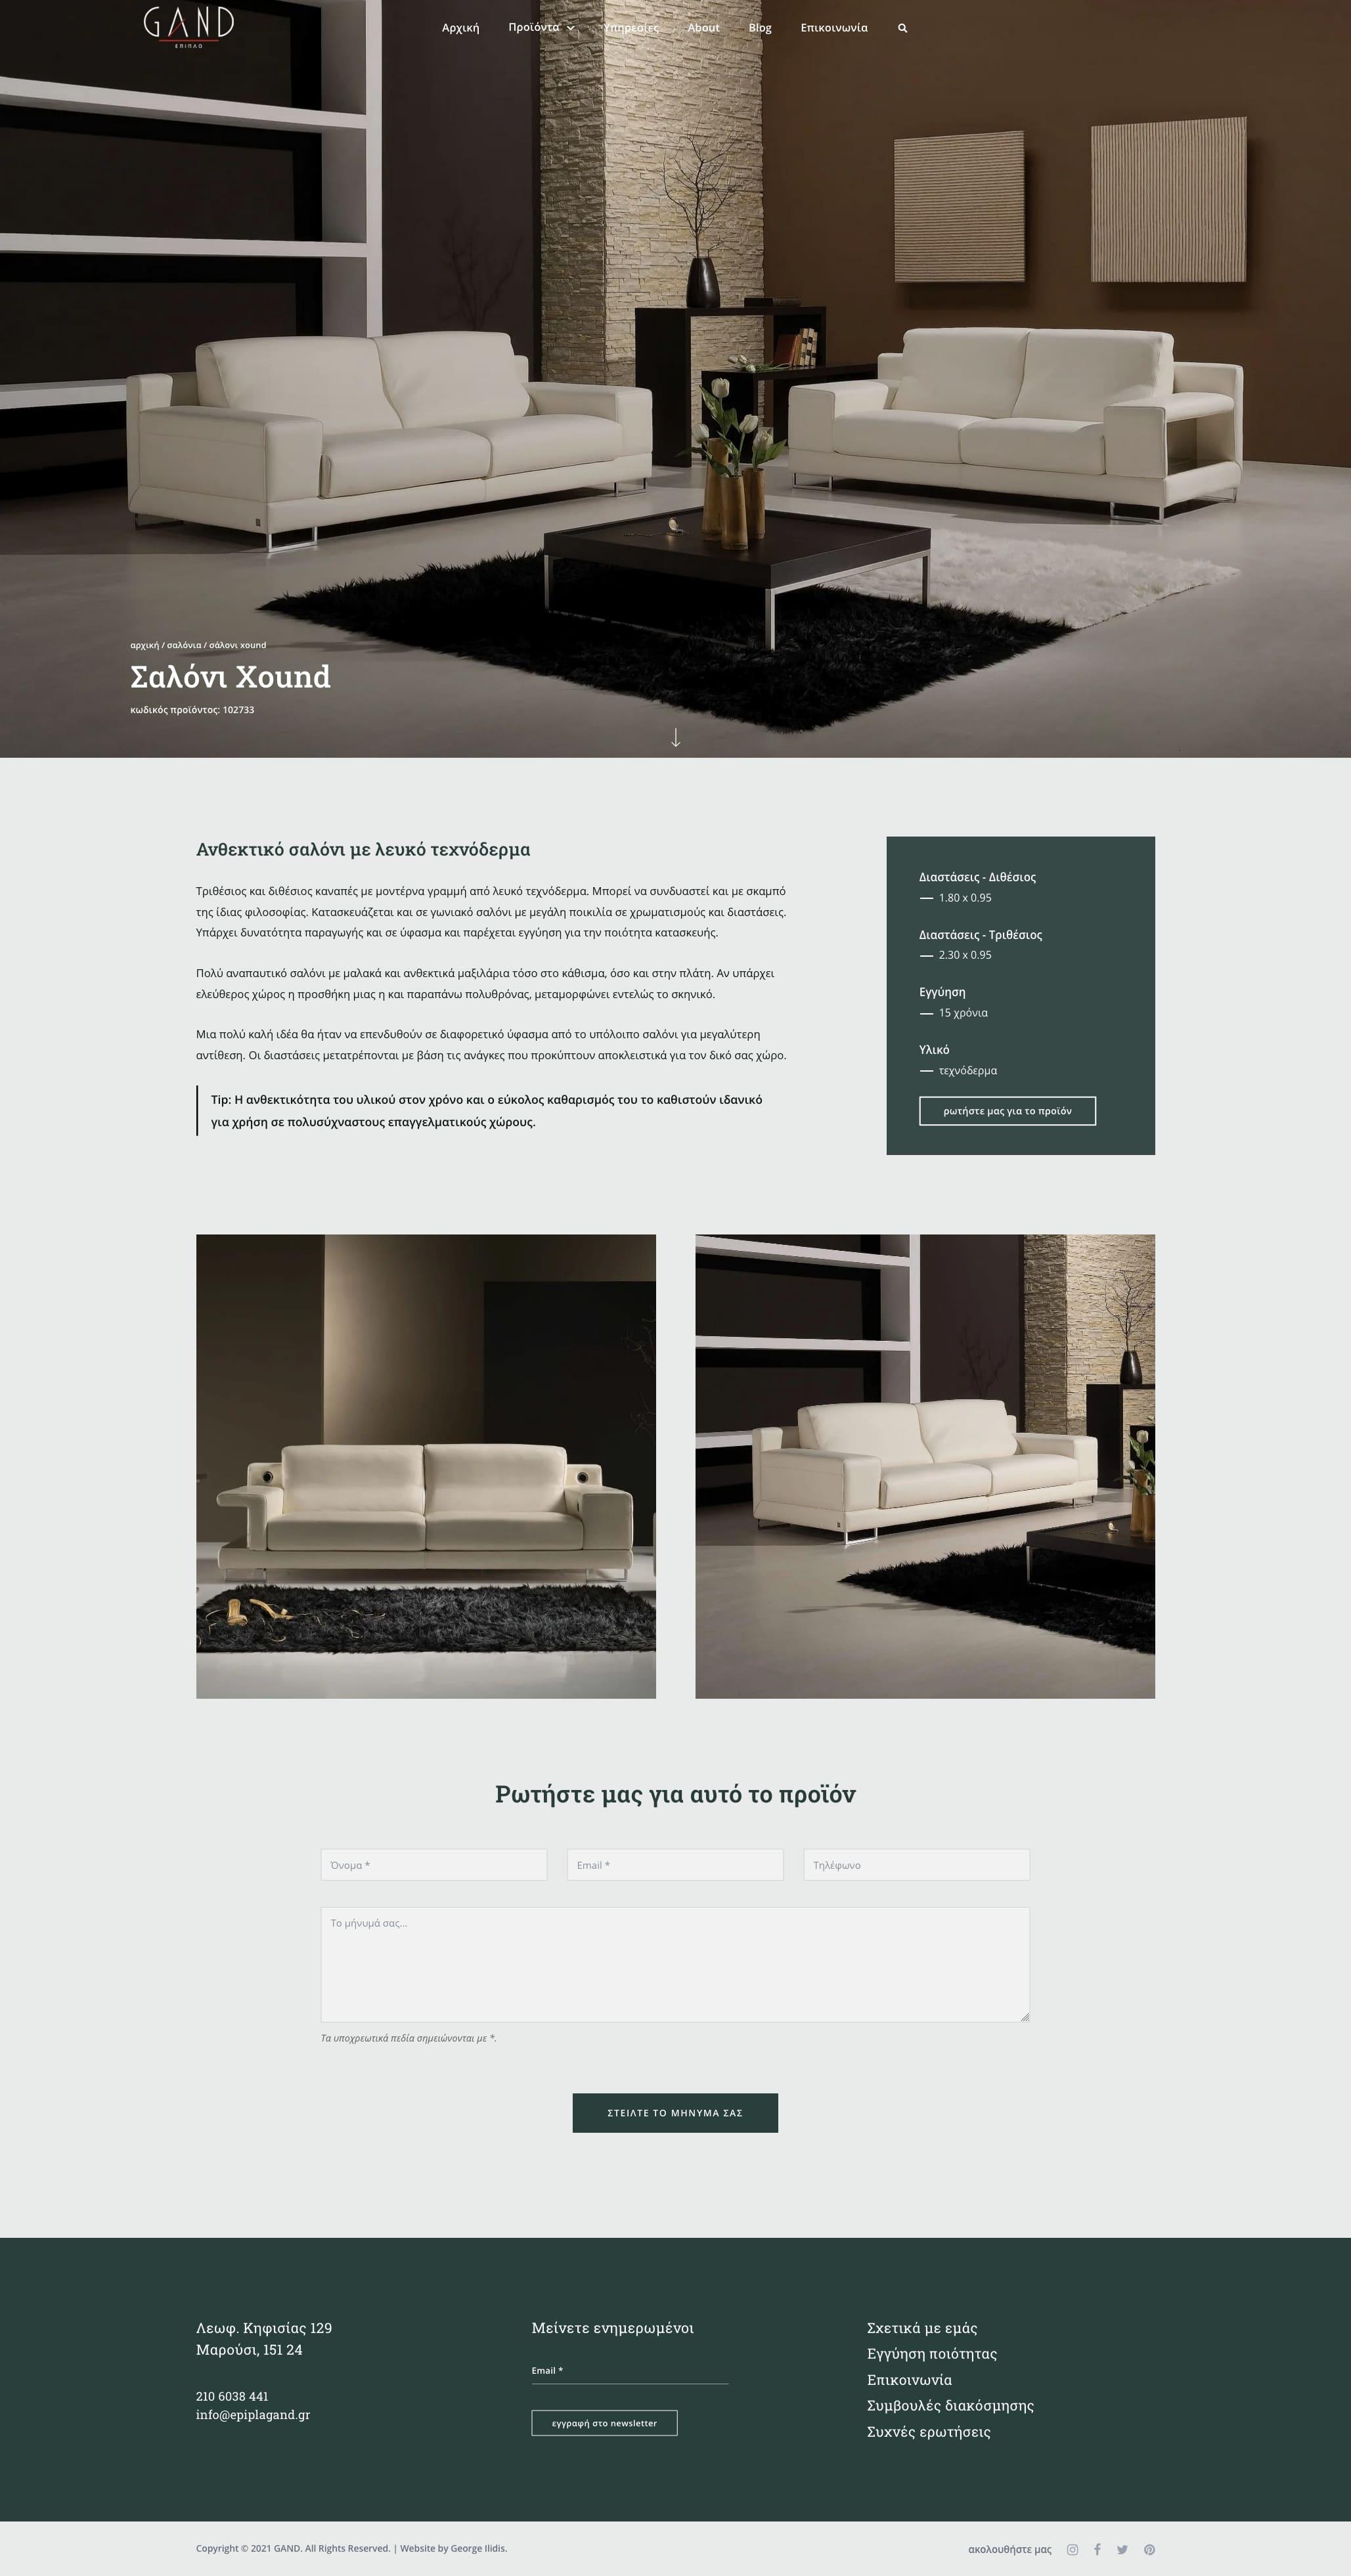 WordPress Website Design & Development - Product Page - GAND Furniture